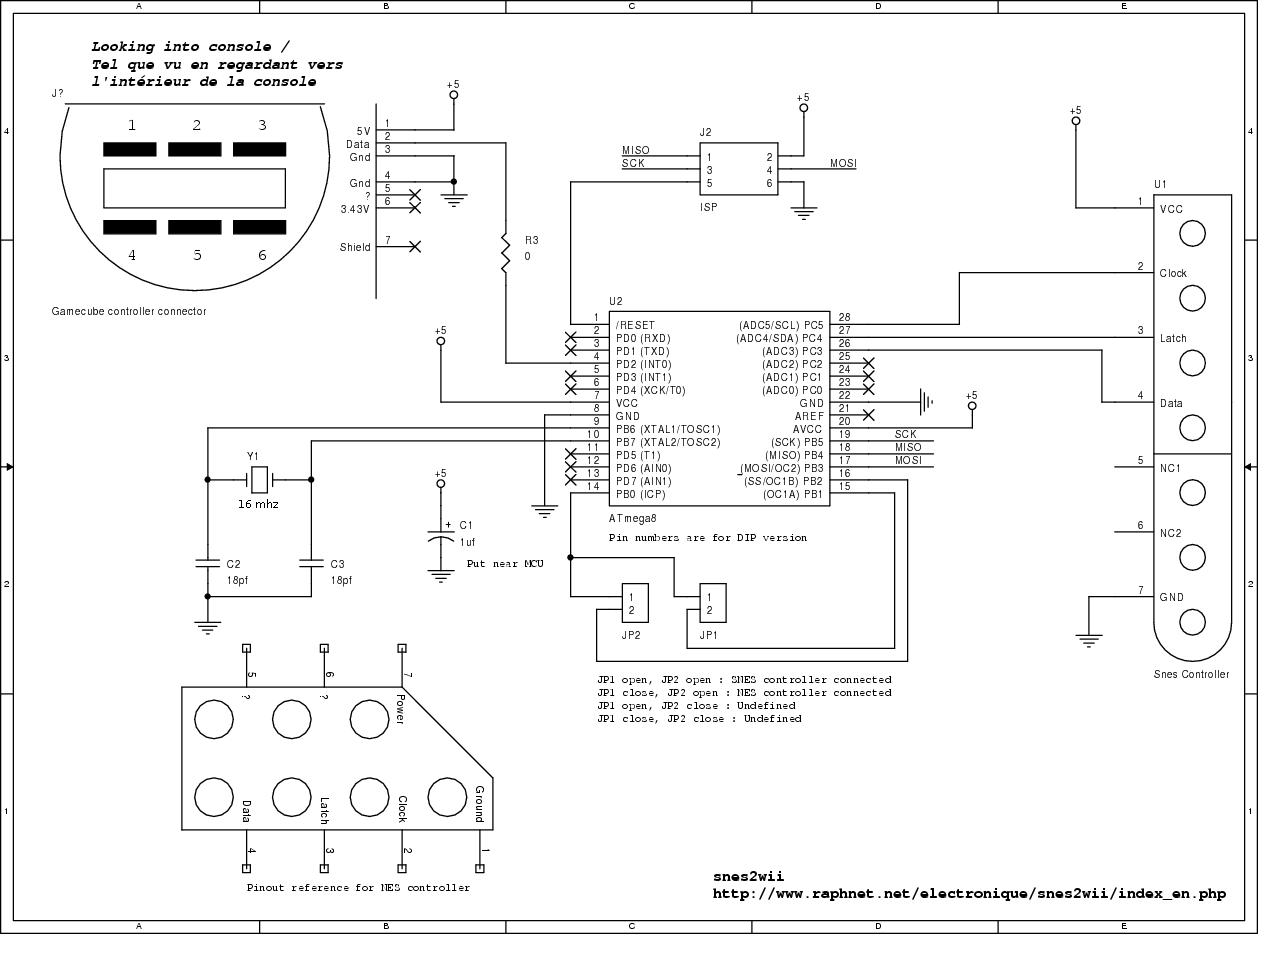 jaguar xk120 wiring diagram wiring library 1954 corvette wiring diagram 1954 jaguar xk120 wiring diagram wiring diagrams schematics 1954 xk 120 1954 jaguar xk120 wiring diagram